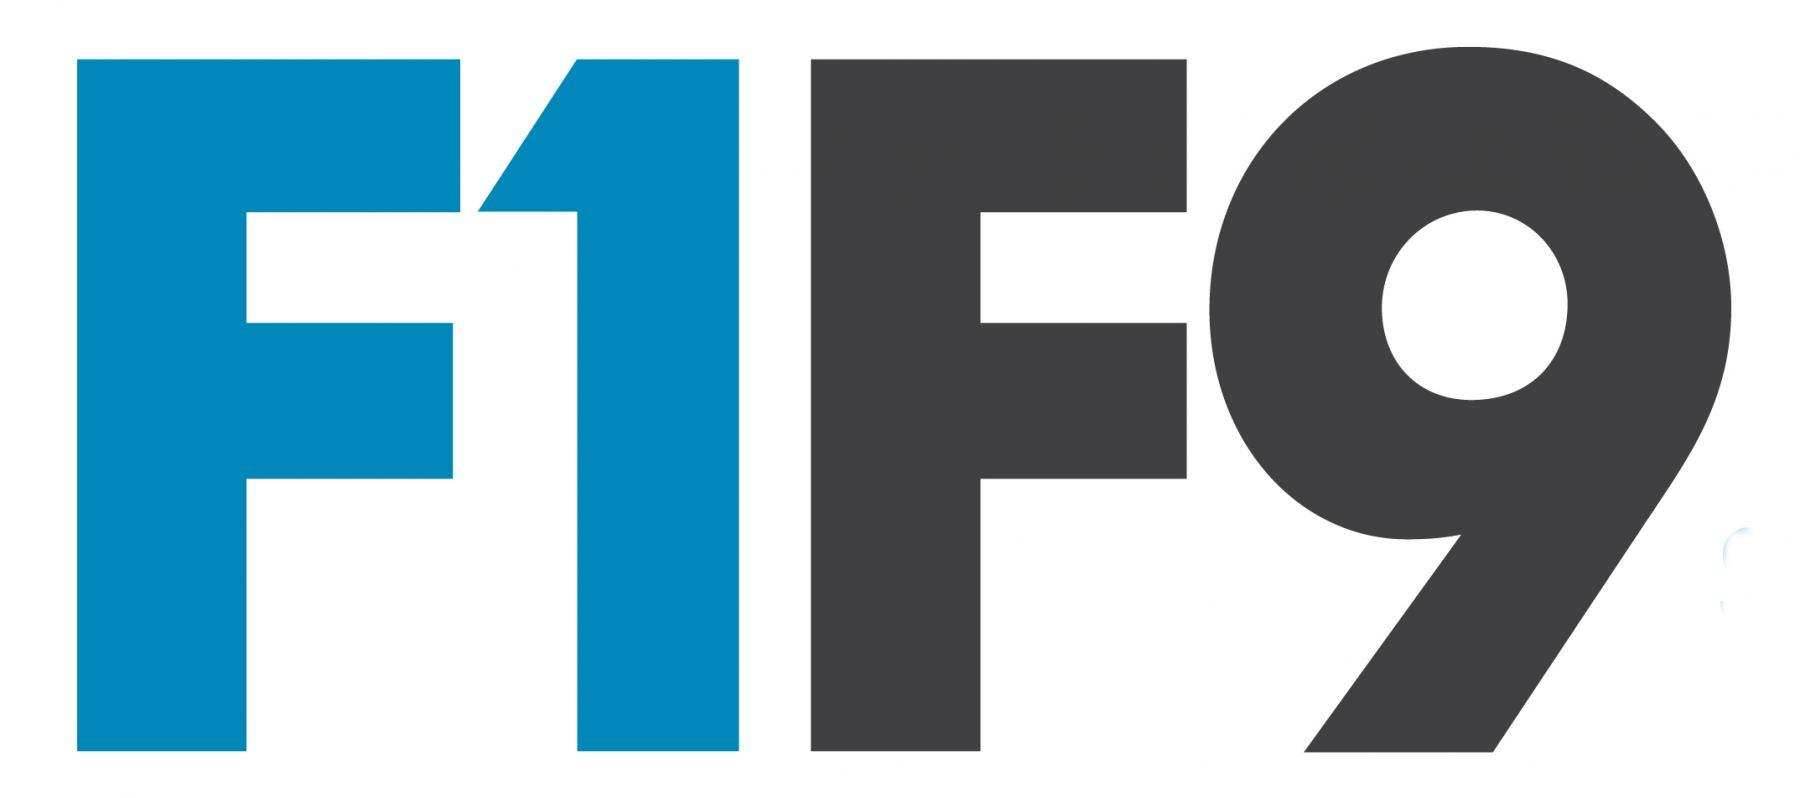 F1F9_Master_Origination